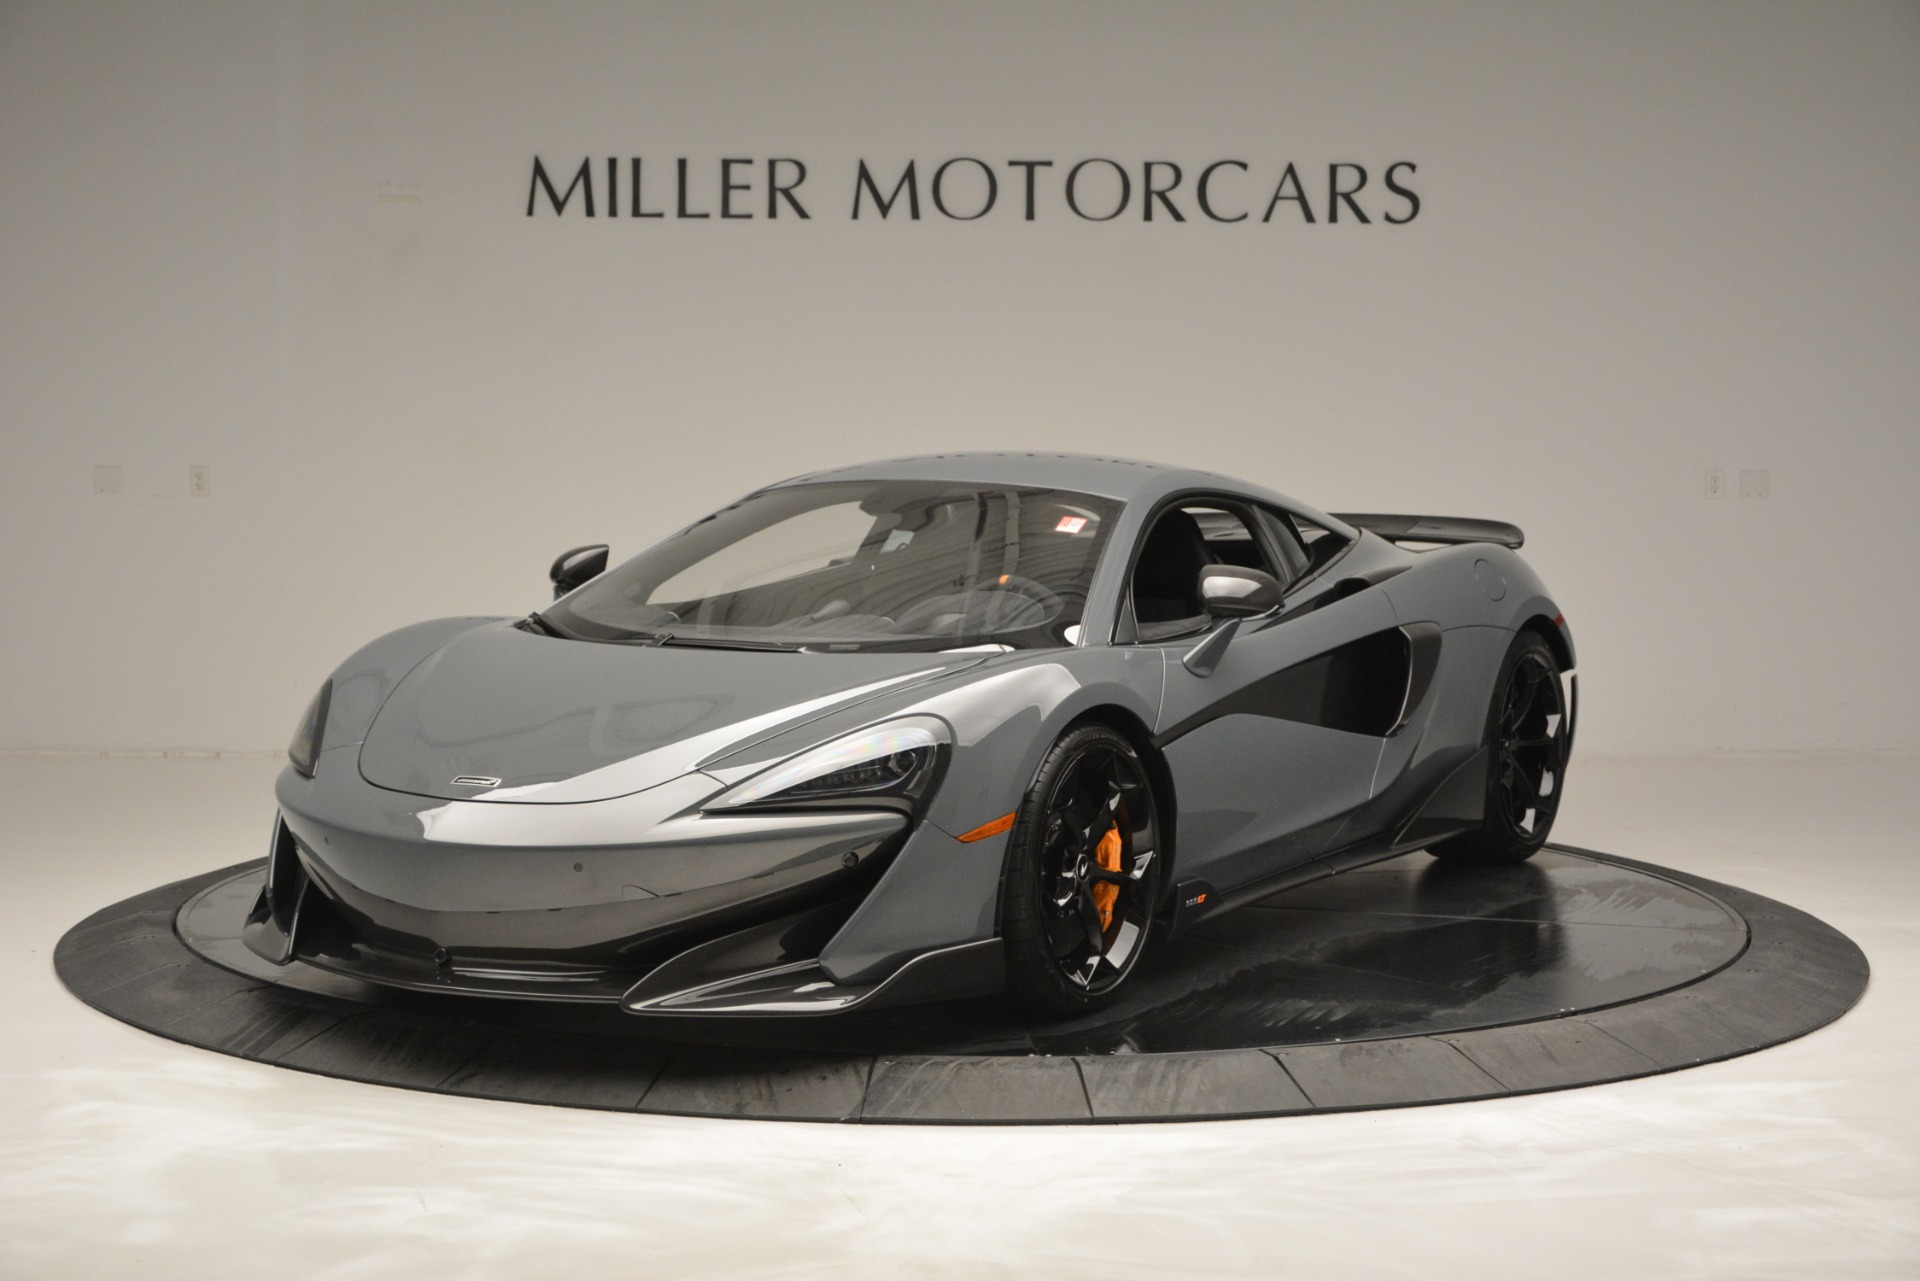 Used 2019 McLaren 600LT Luxury for sale Sold at Alfa Romeo of Westport in Westport CT 06880 1